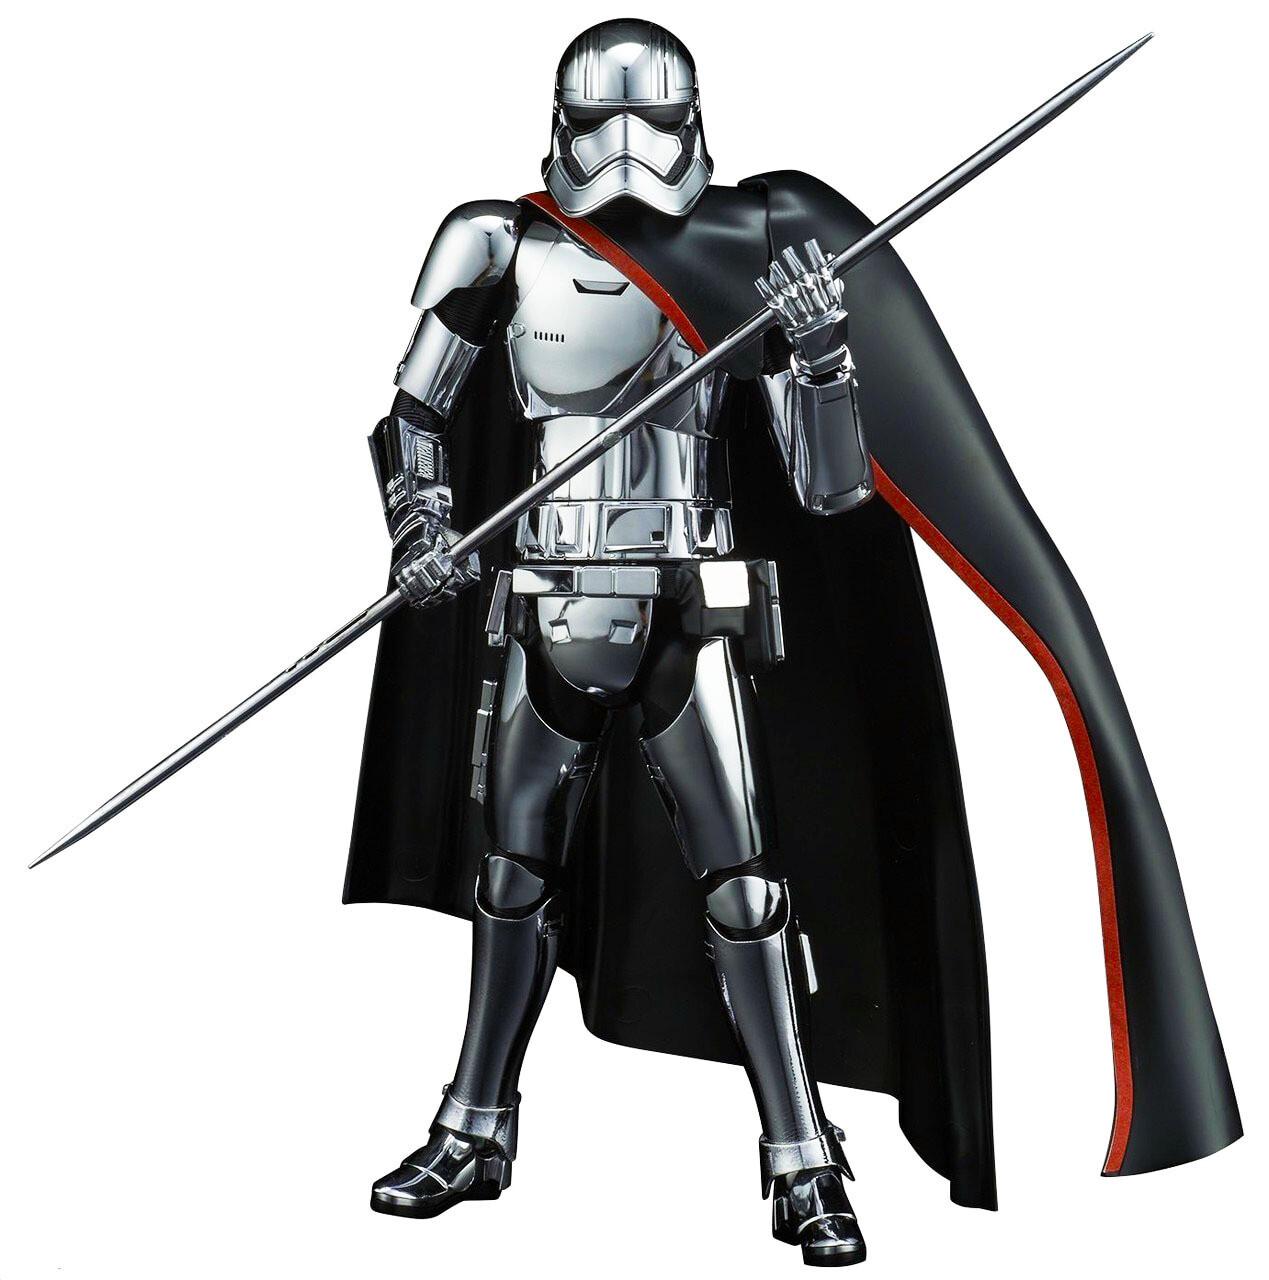 Captain Phasma Star Wars The Last Jedi 1:12 Scale Model Kit Figure